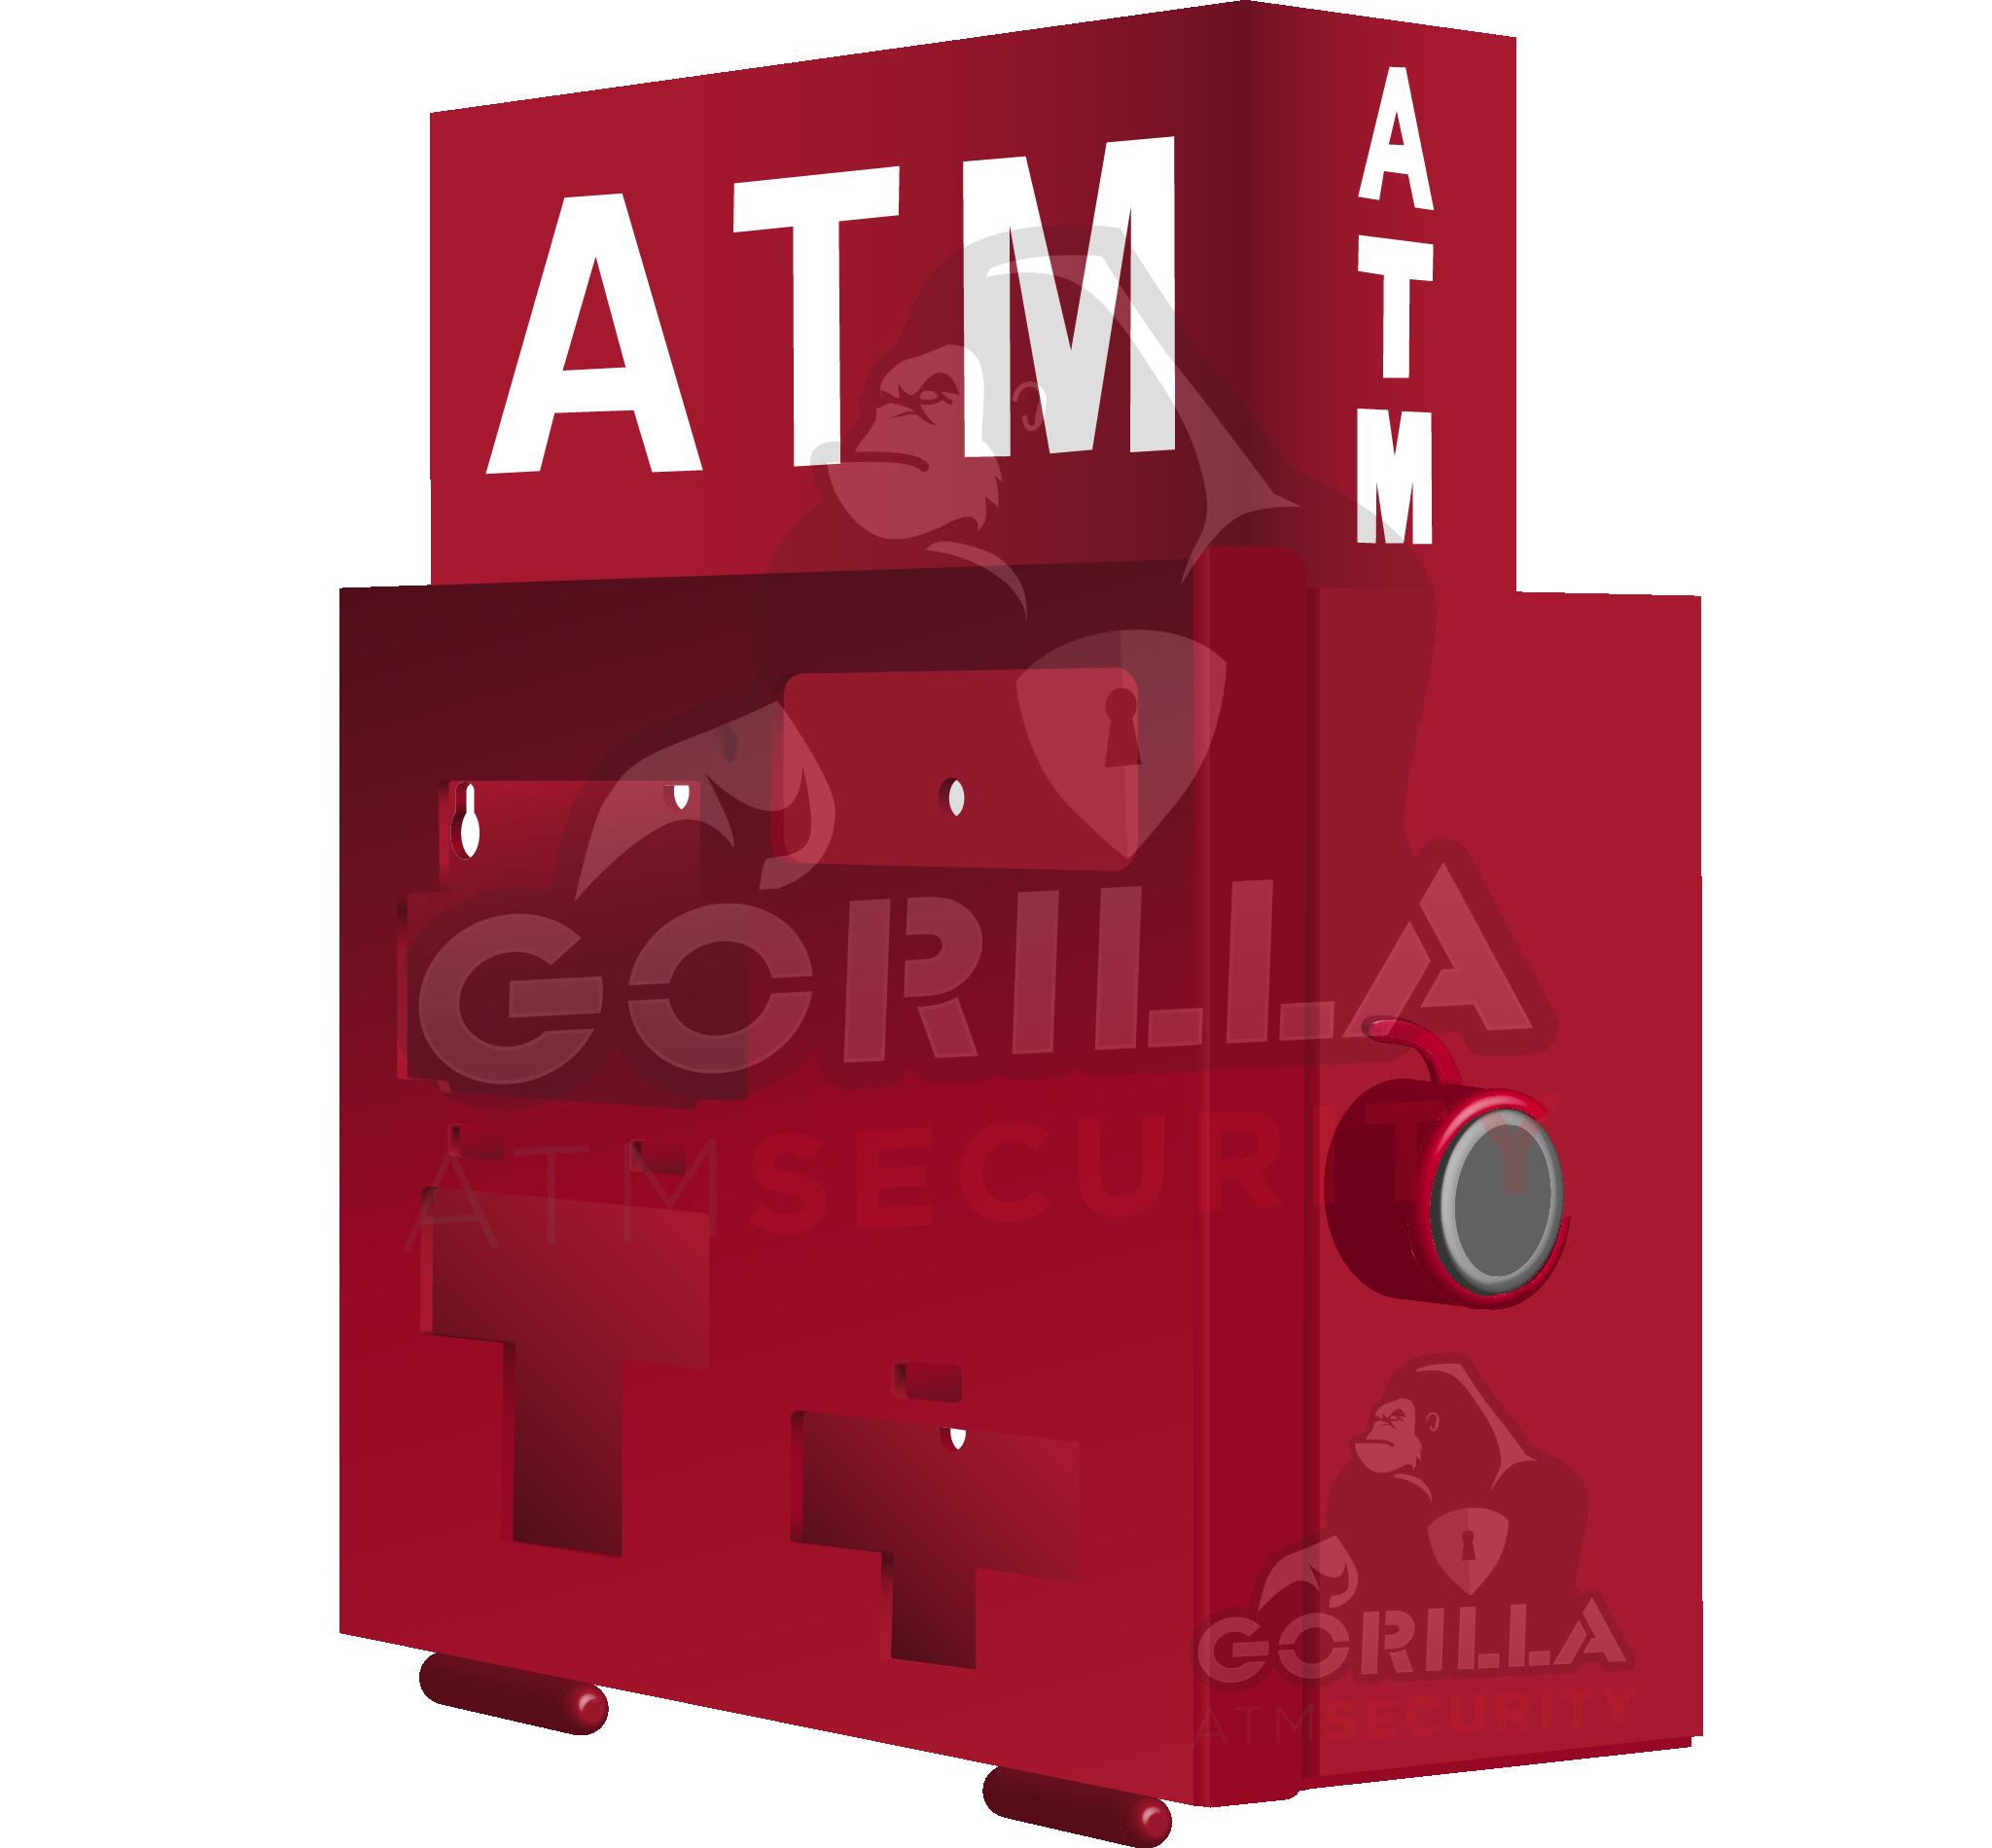 Gorilla ATM Security Enclosures - Raleigh, NC - Gorilla ATM Security